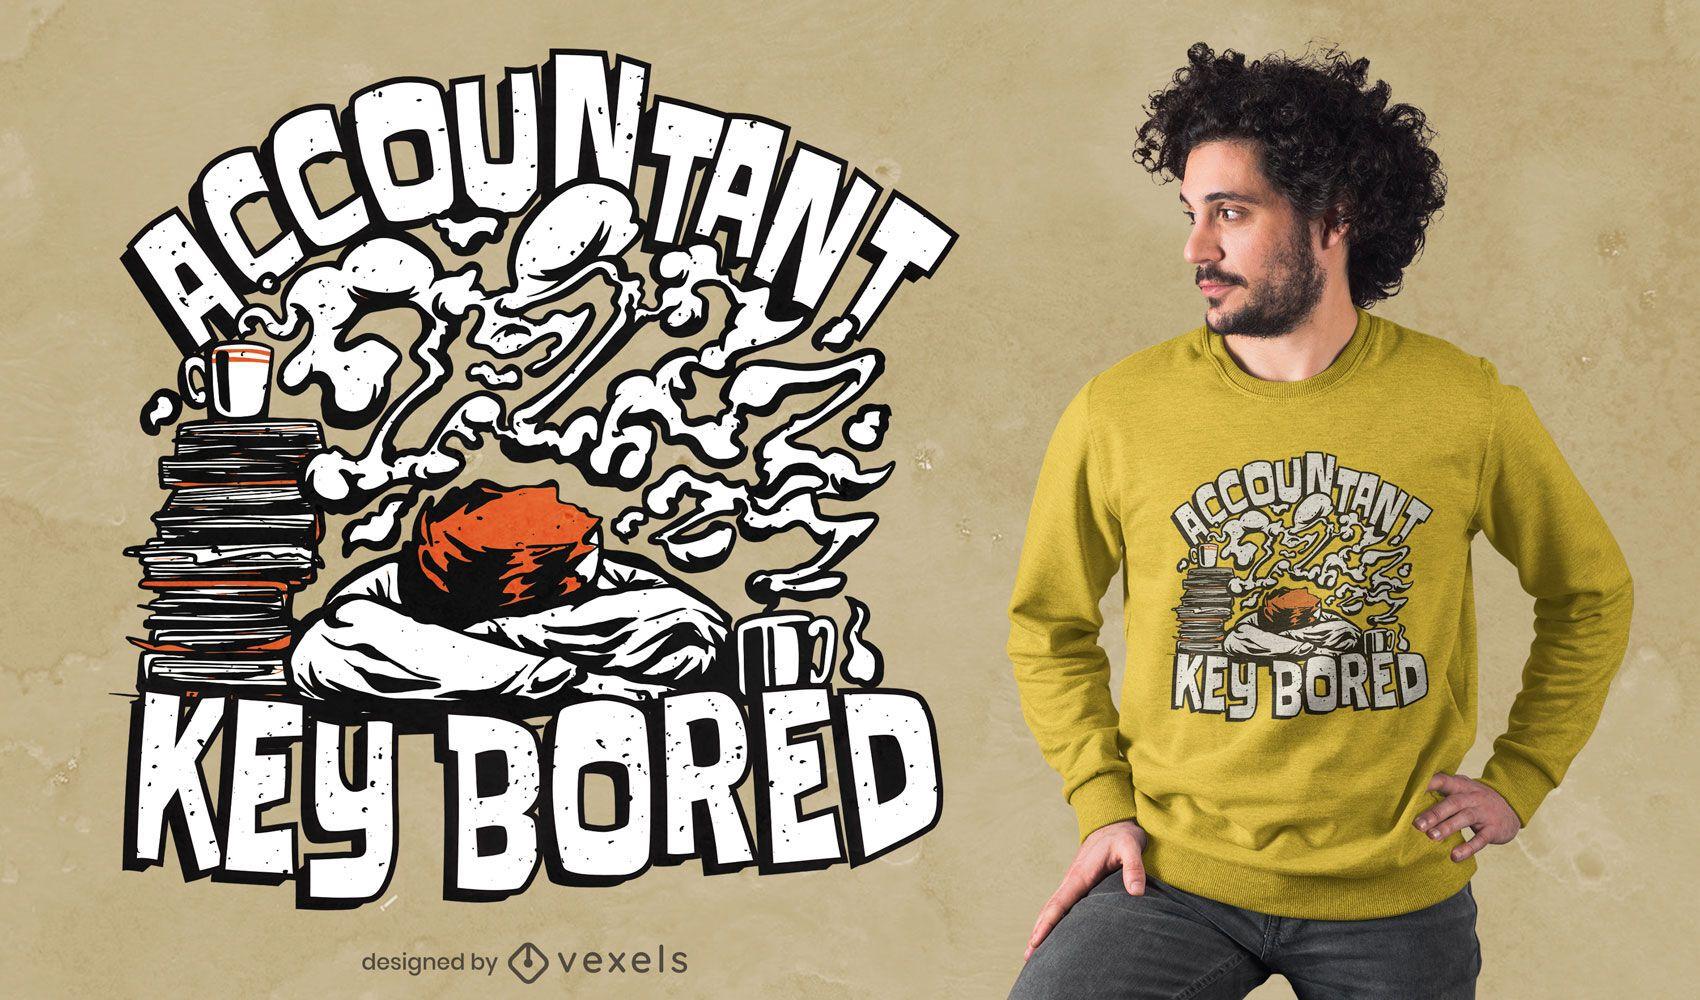 Diseño de camiseta de cita de contador cansado